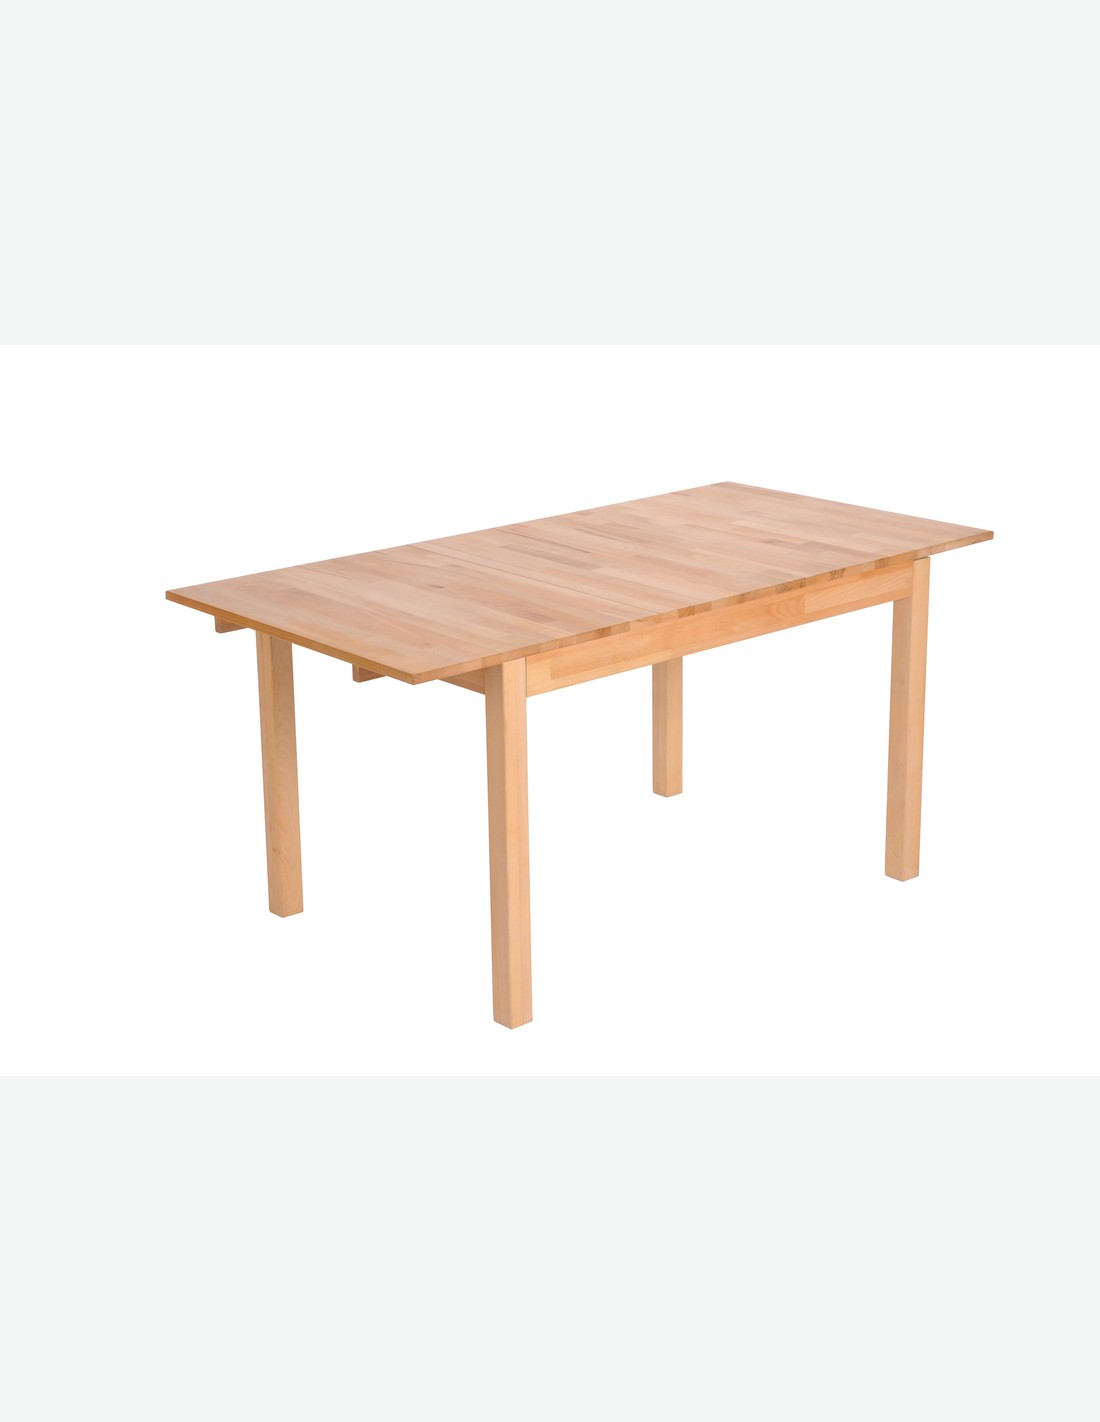 Alf tavoli da pranzo avantishop - Tavolo da pranzo misure ...